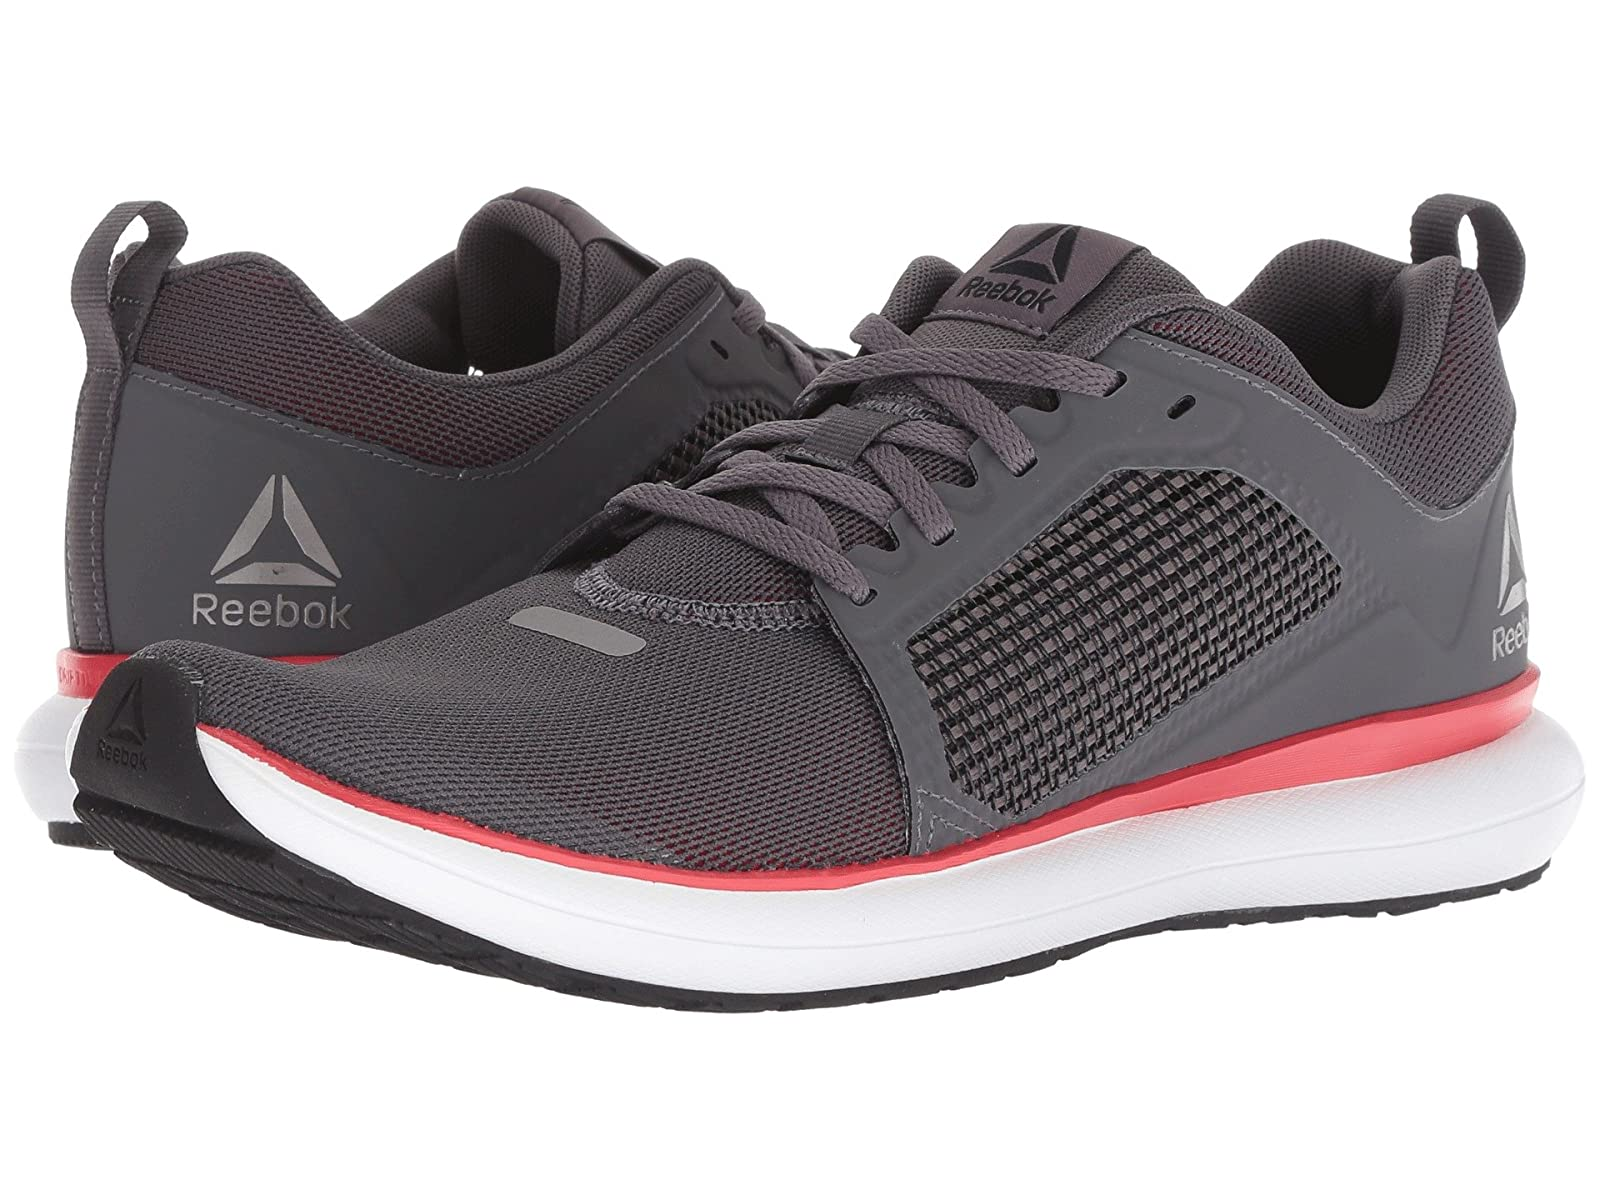 Reebok Driftium RideCheap and distinctive eye-catching shoes